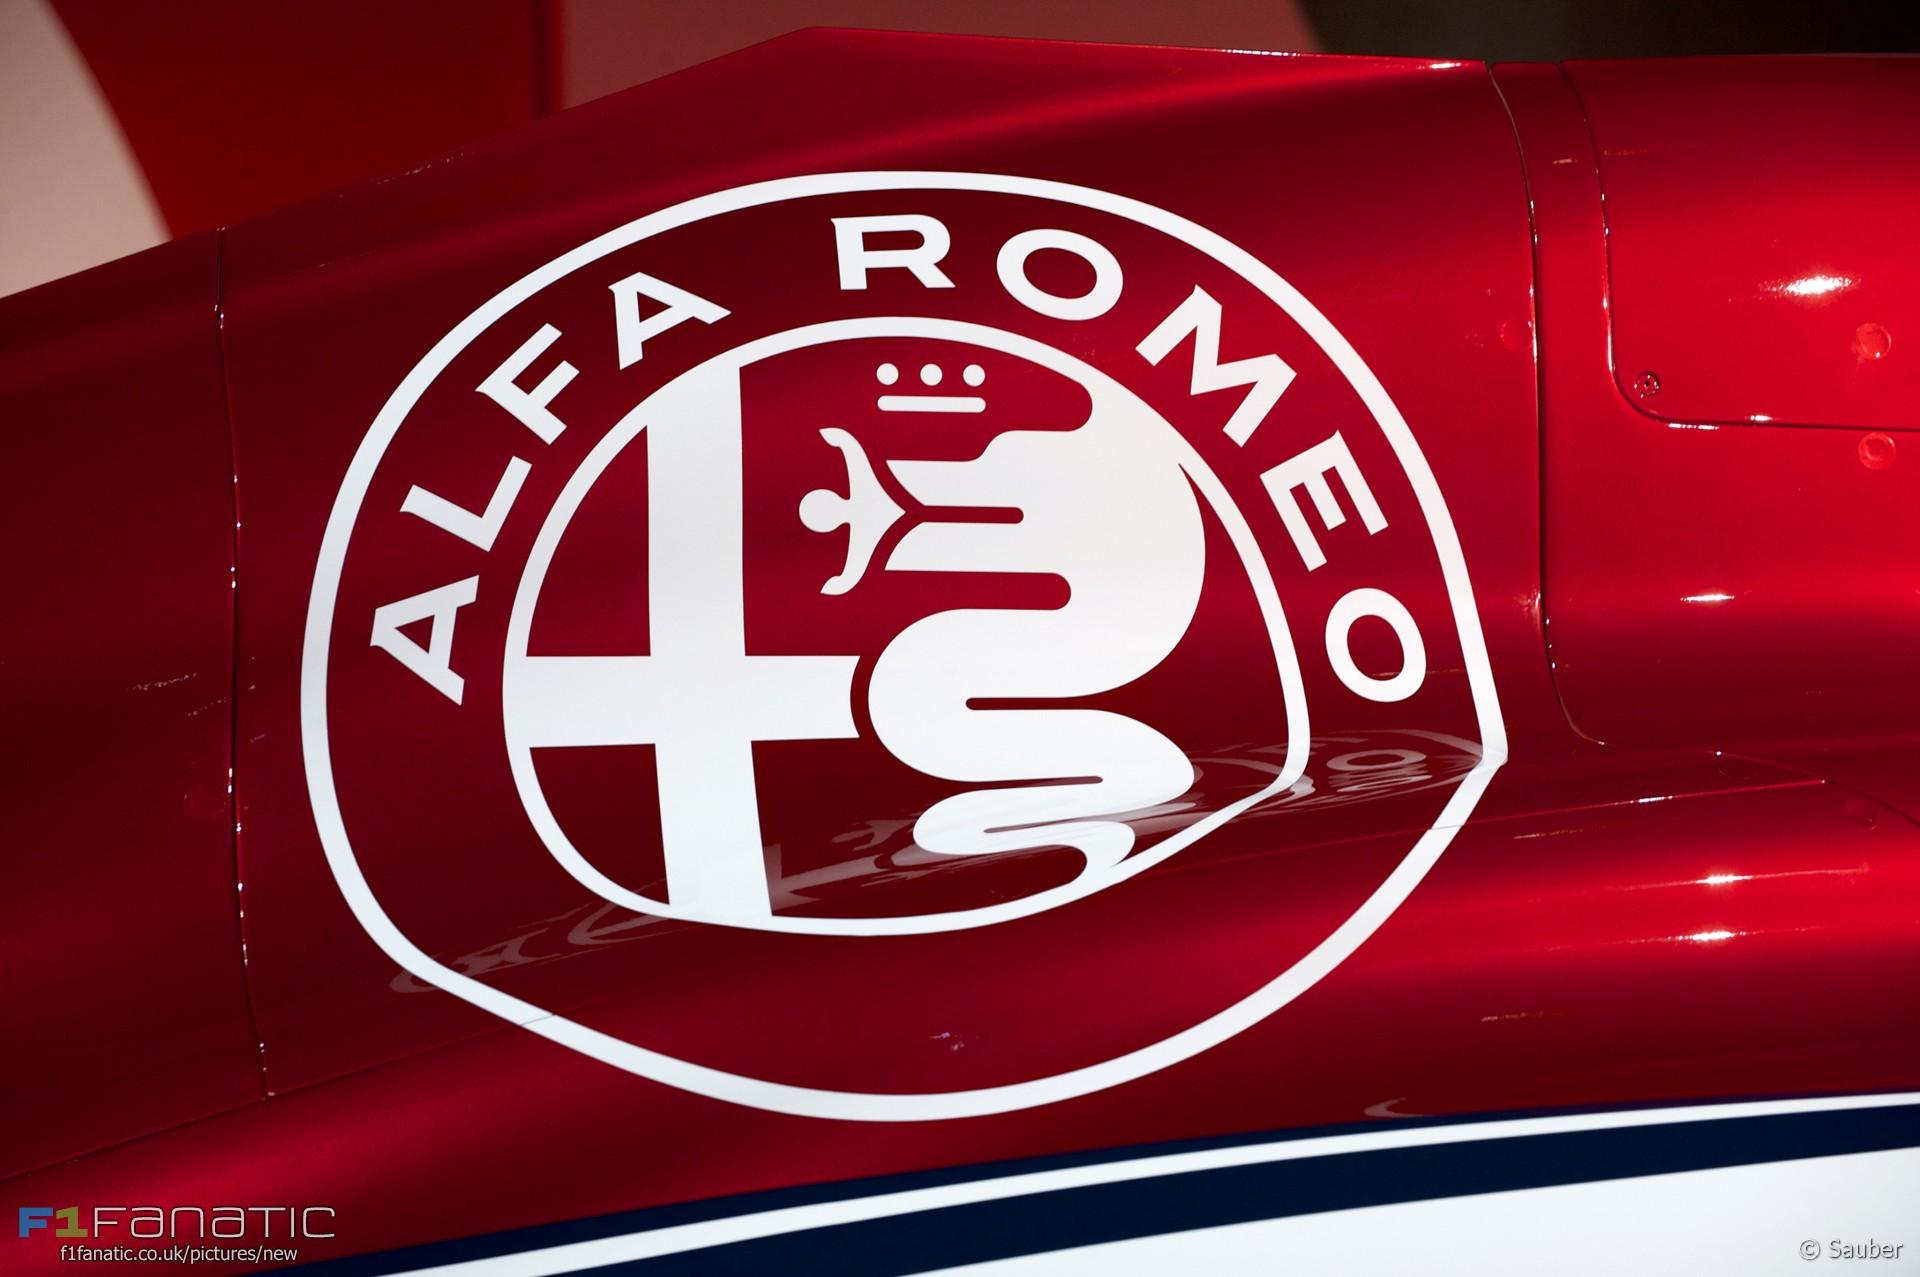 sauber unveils concept alfa romeo livery for 2018 racefans. Black Bedroom Furniture Sets. Home Design Ideas